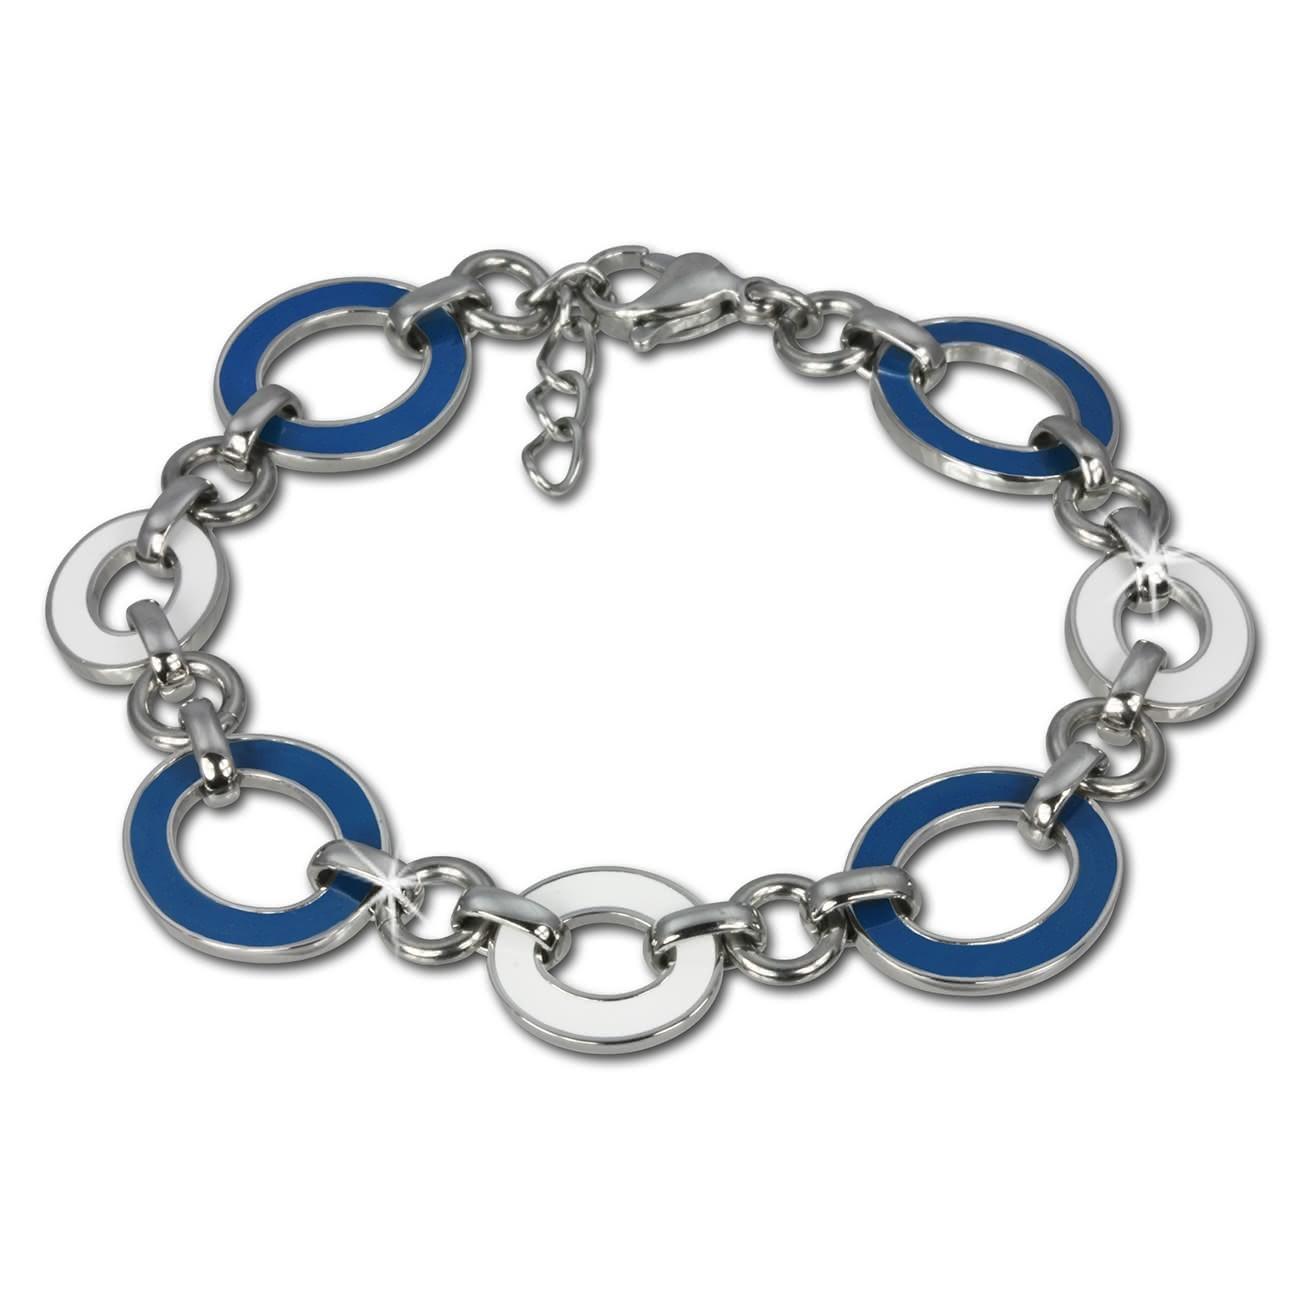 Amello Armband Oval Emaille blau/weiß Damen Edelstahlschmuck ESAG01B